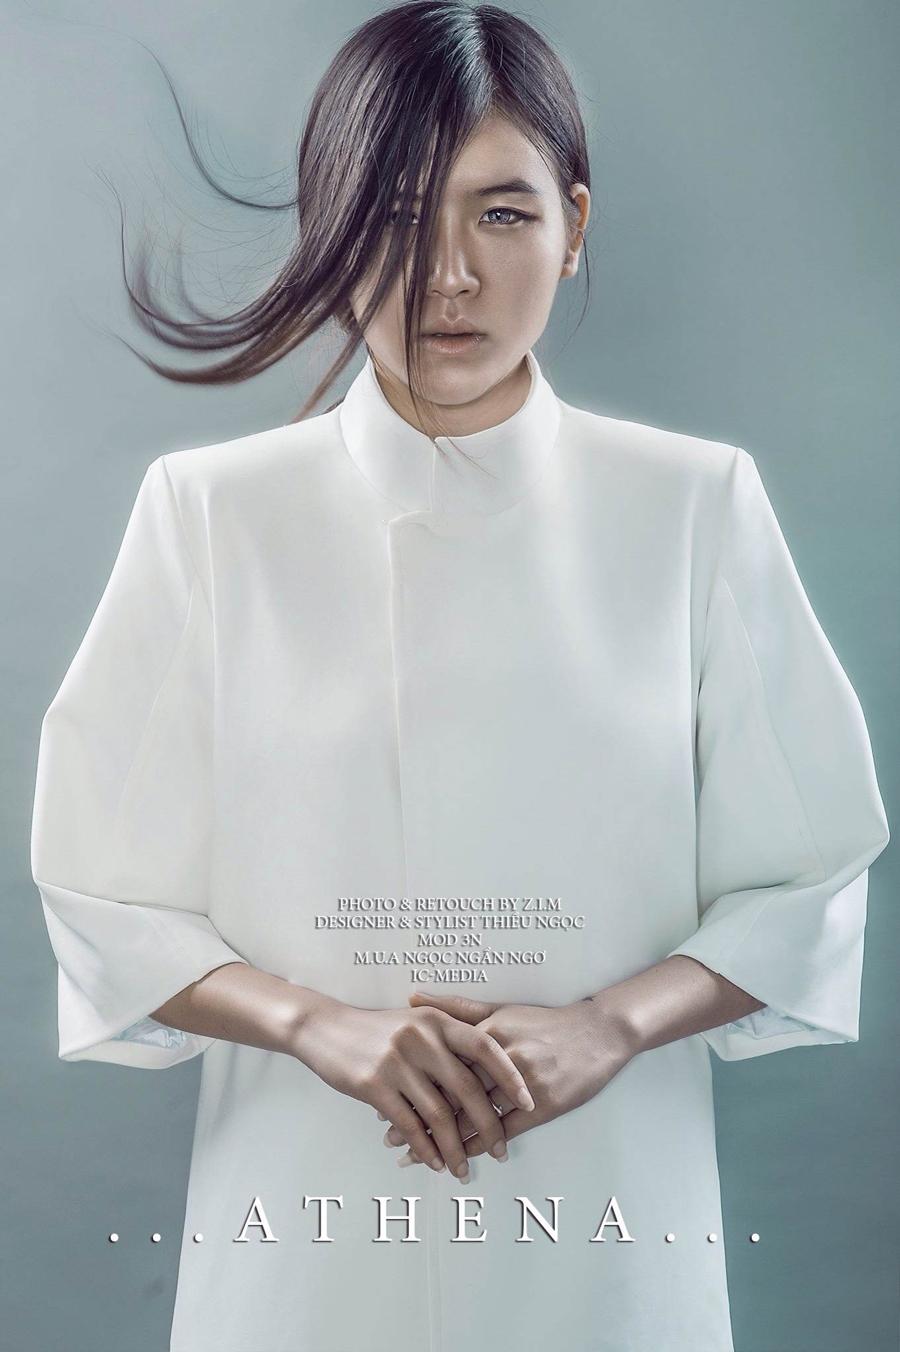 Stylist Thiều Ngọc